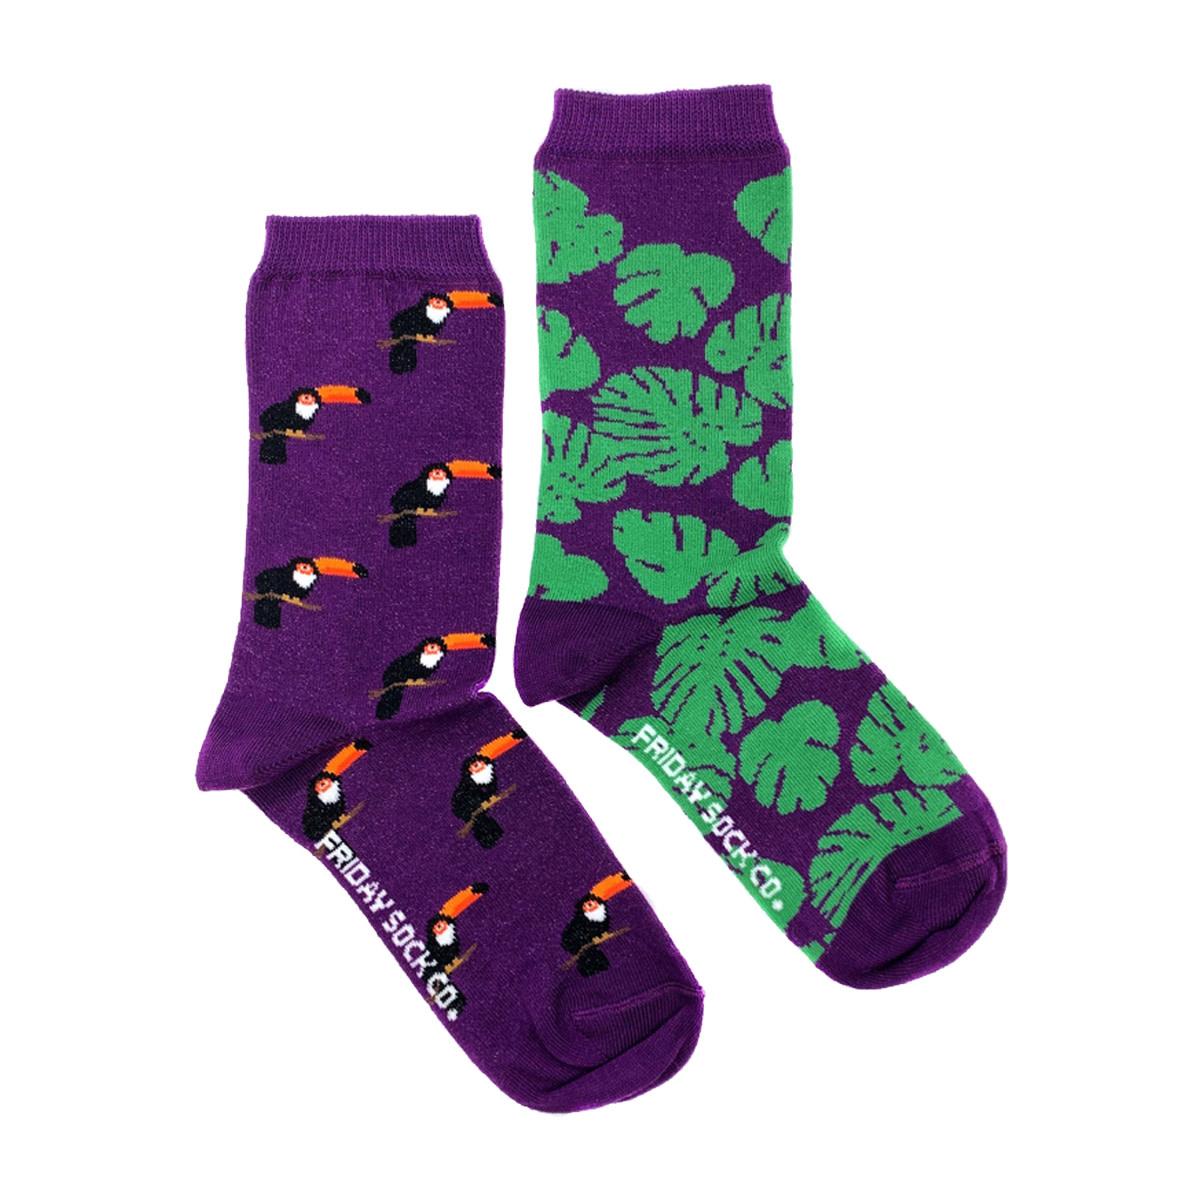 Friday Sock Co. Friday Sock Co. Women's Toucan & Monstera Crew W 5 - 10 (M - 4 - 8)